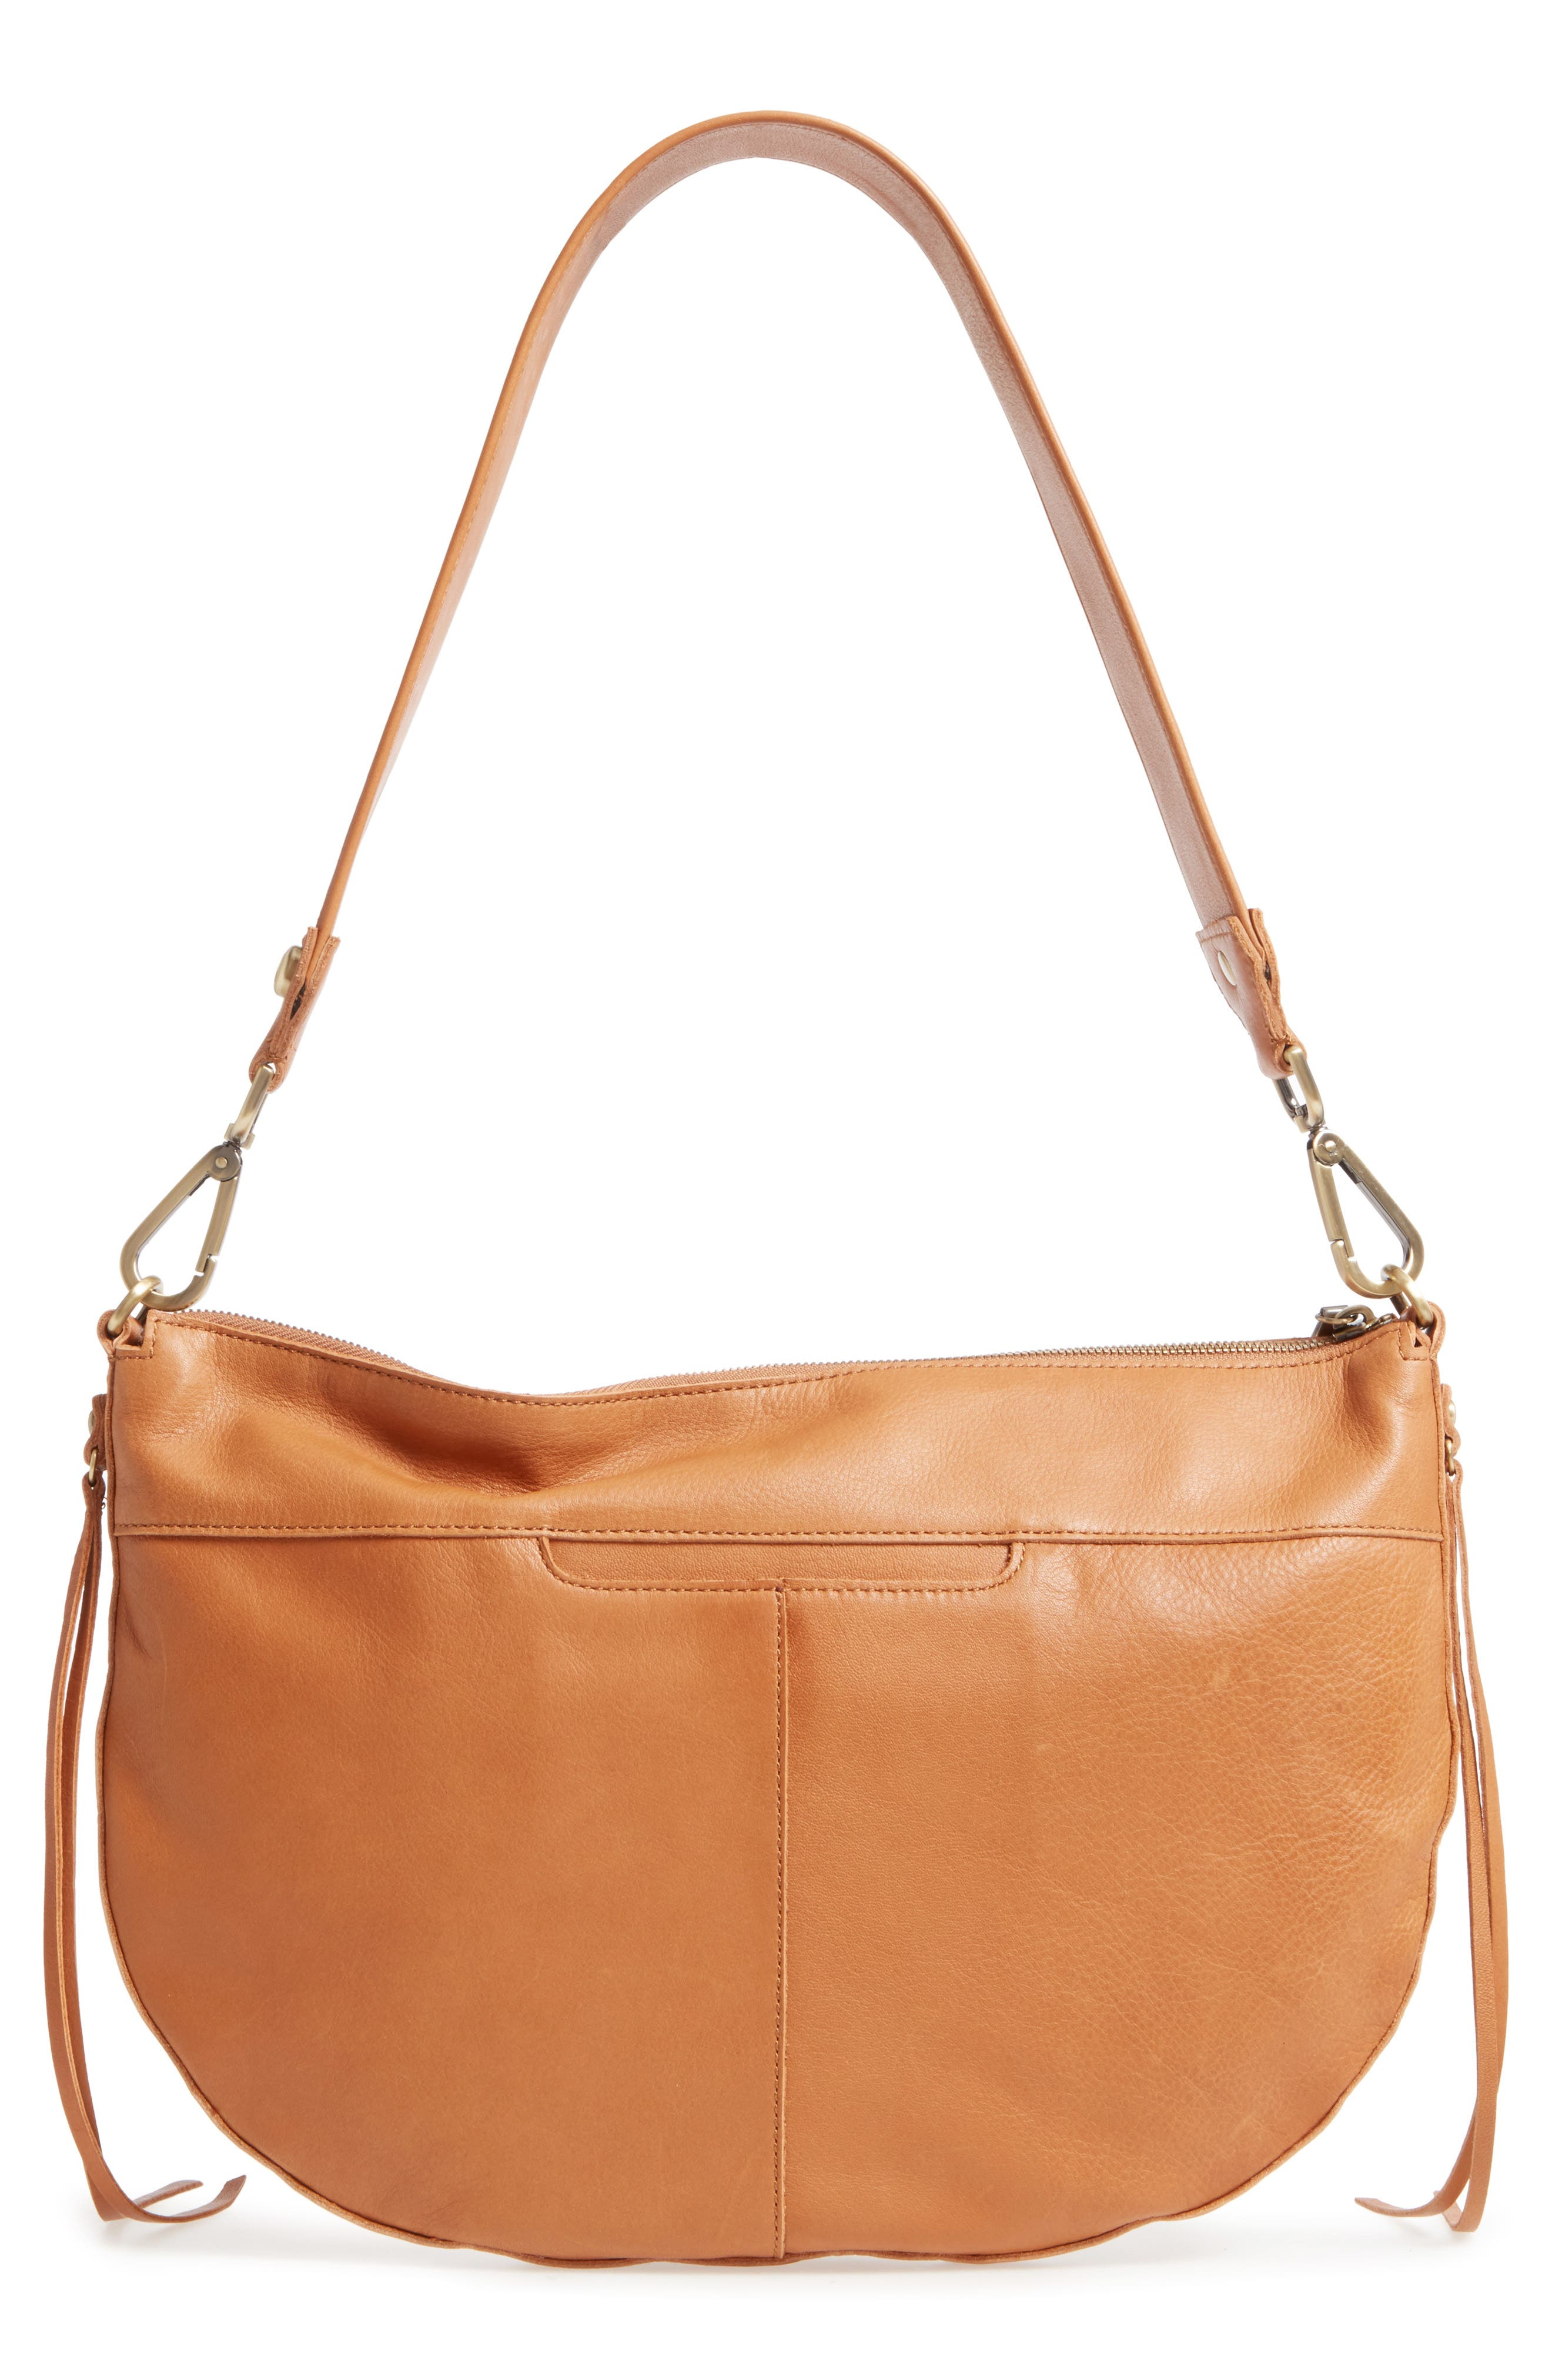 Cisco Calfskin Leather Hobo Bag,                             Alternate thumbnail 2, color,                             Natural